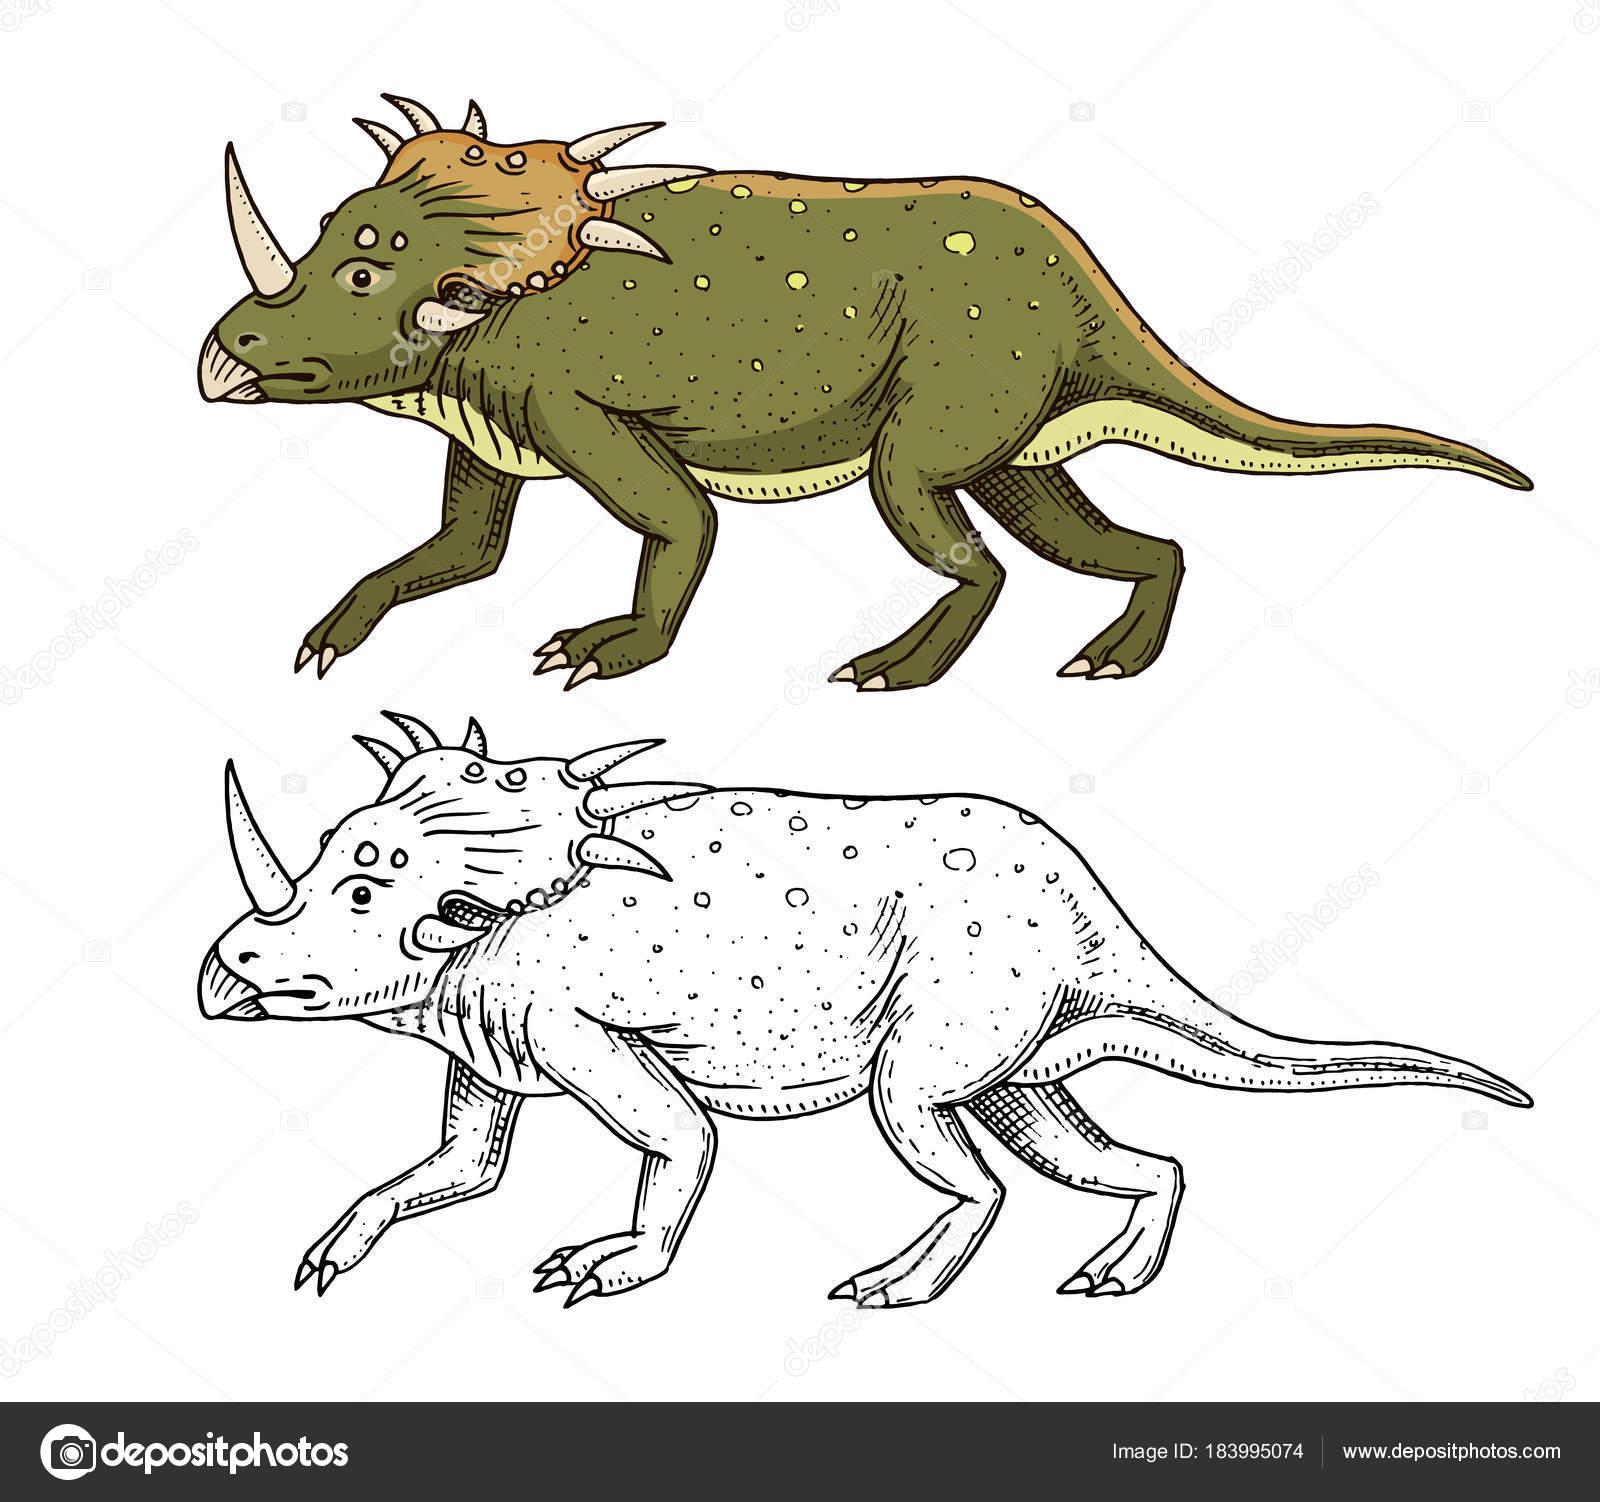 1600x1502 Dinosaur Triceratops, Skeletons, Fossils. Prehistoric Reptiles